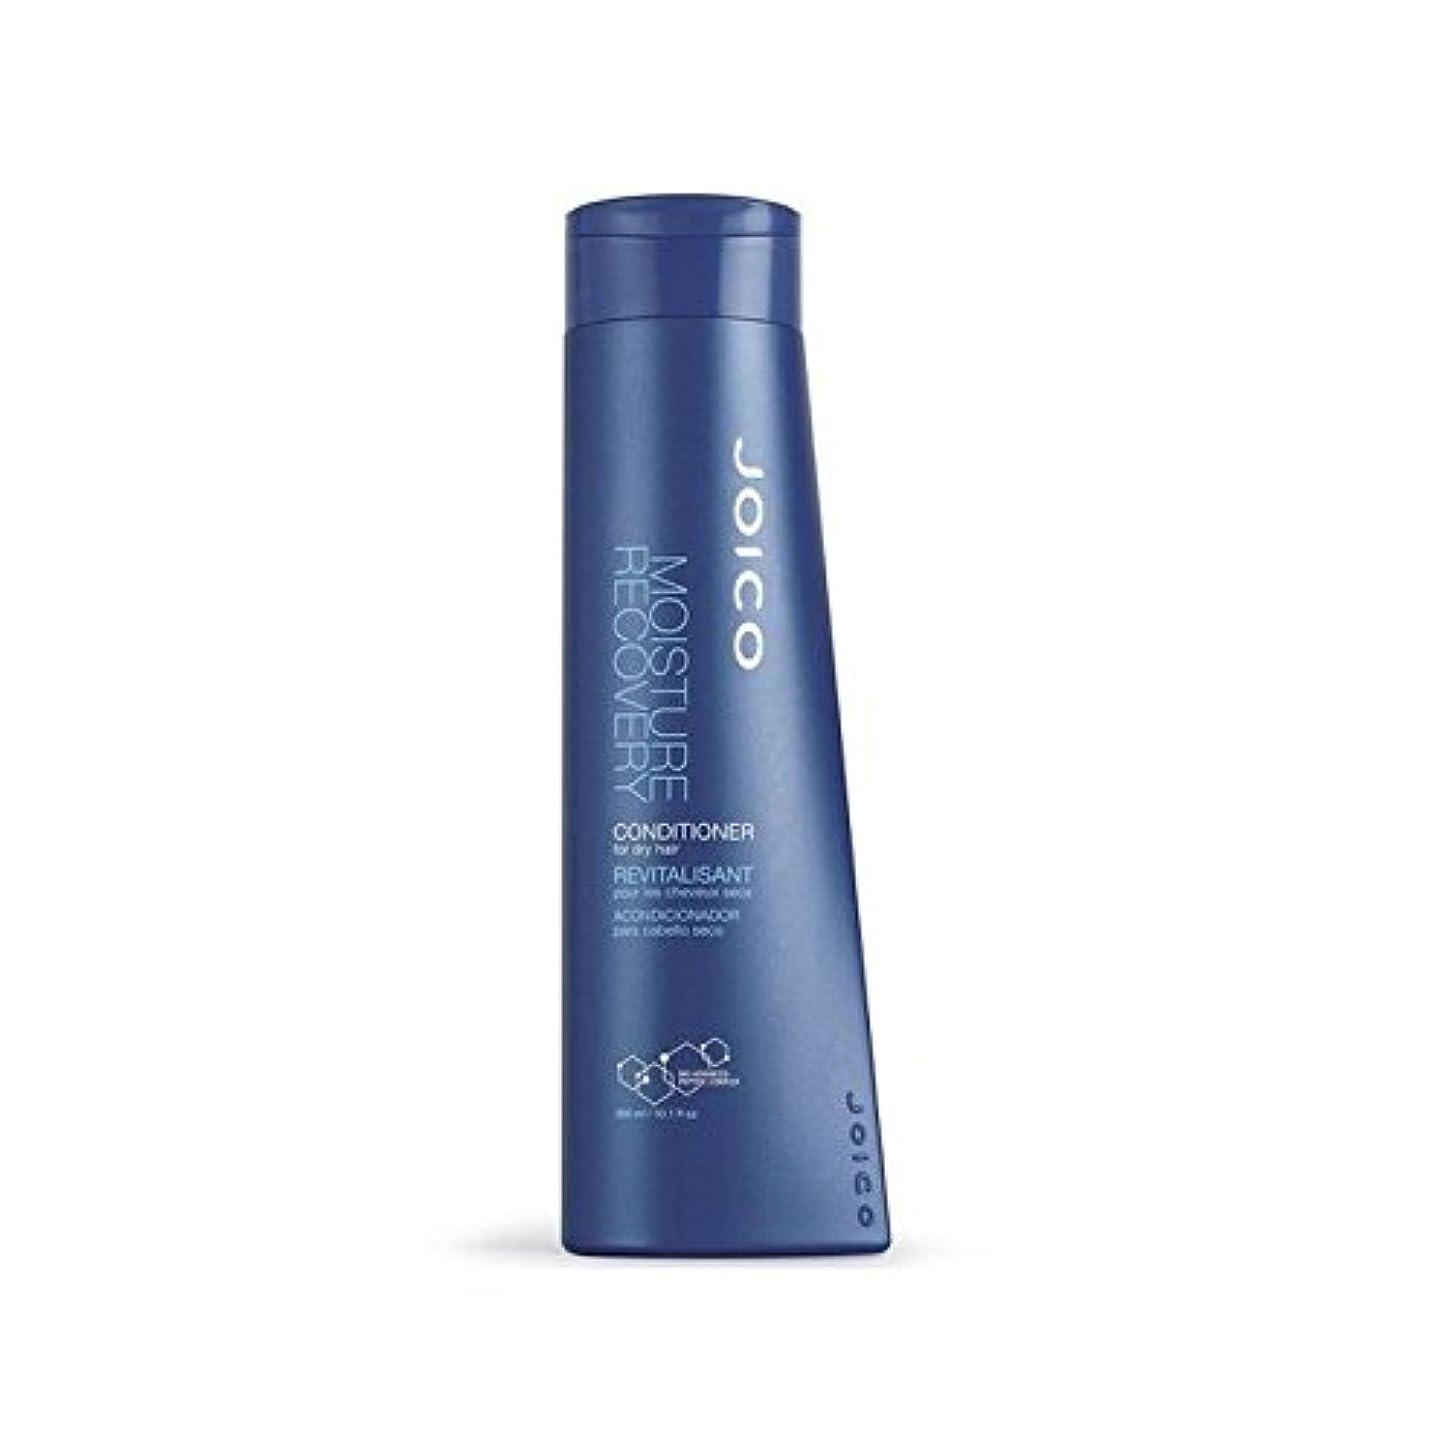 Joico Moisture Recovery Conditioner 300ml - ジョイコ水分回復コンディショナー300ミリリットル [並行輸入品]